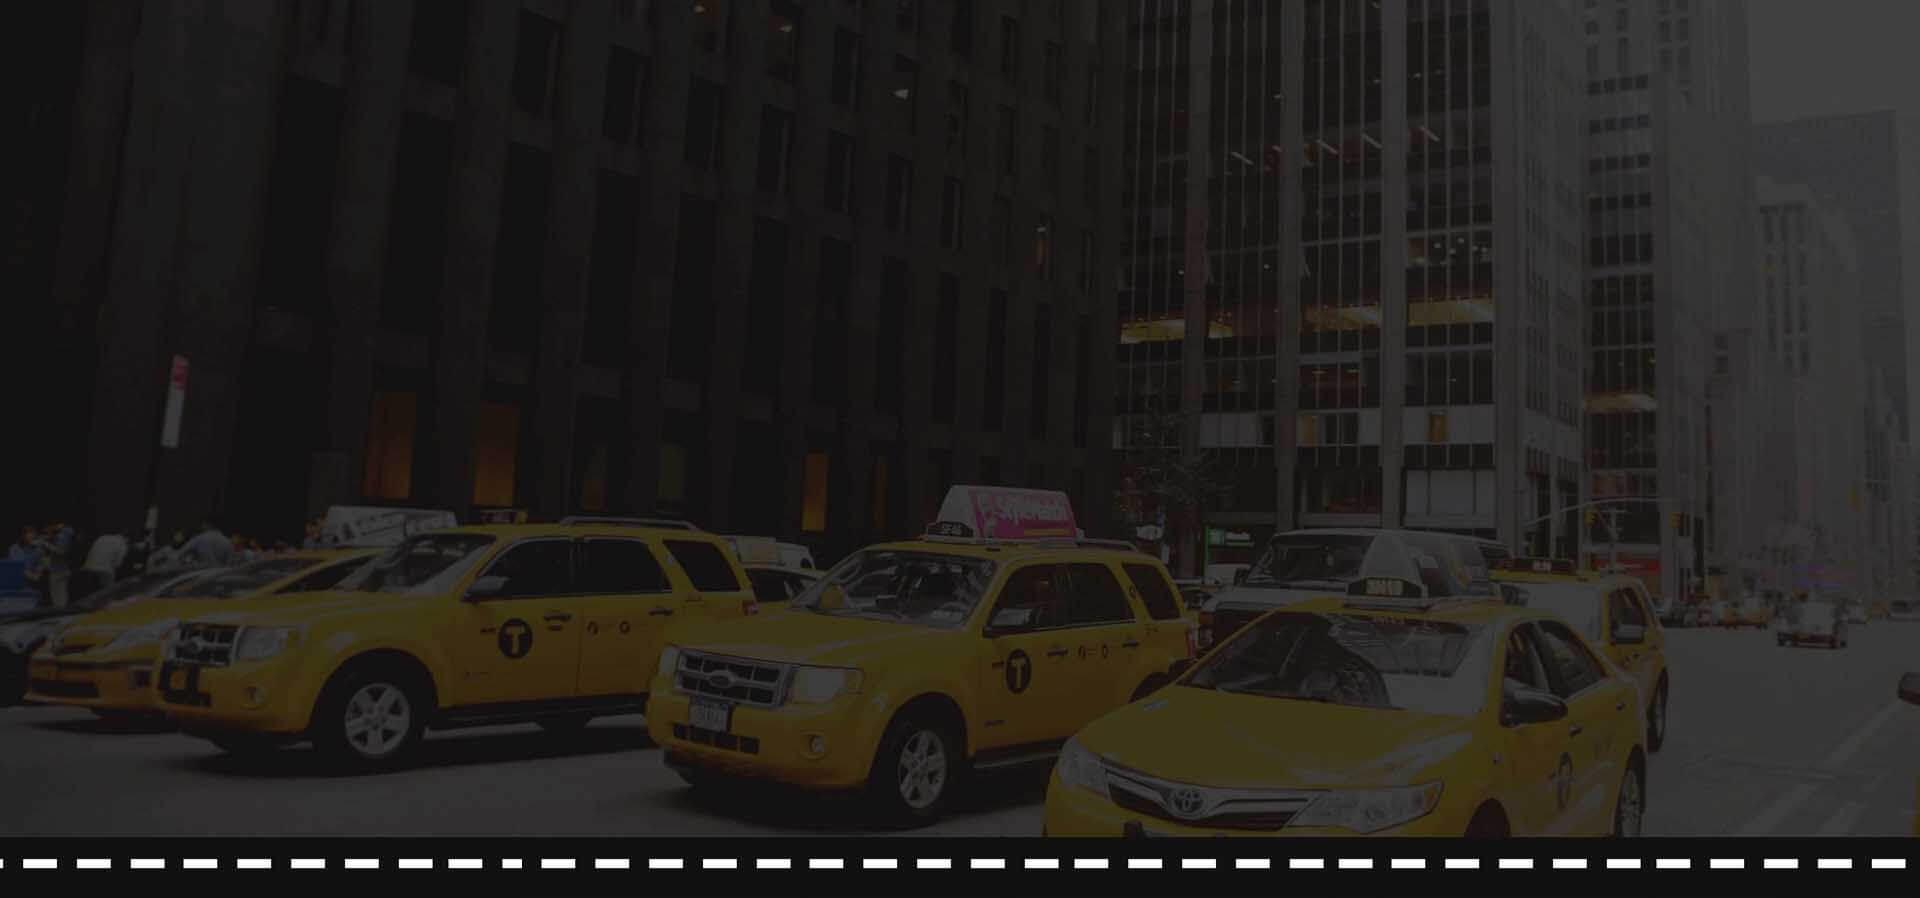 Taxi Booking App Development Company   Cab Software like Ola